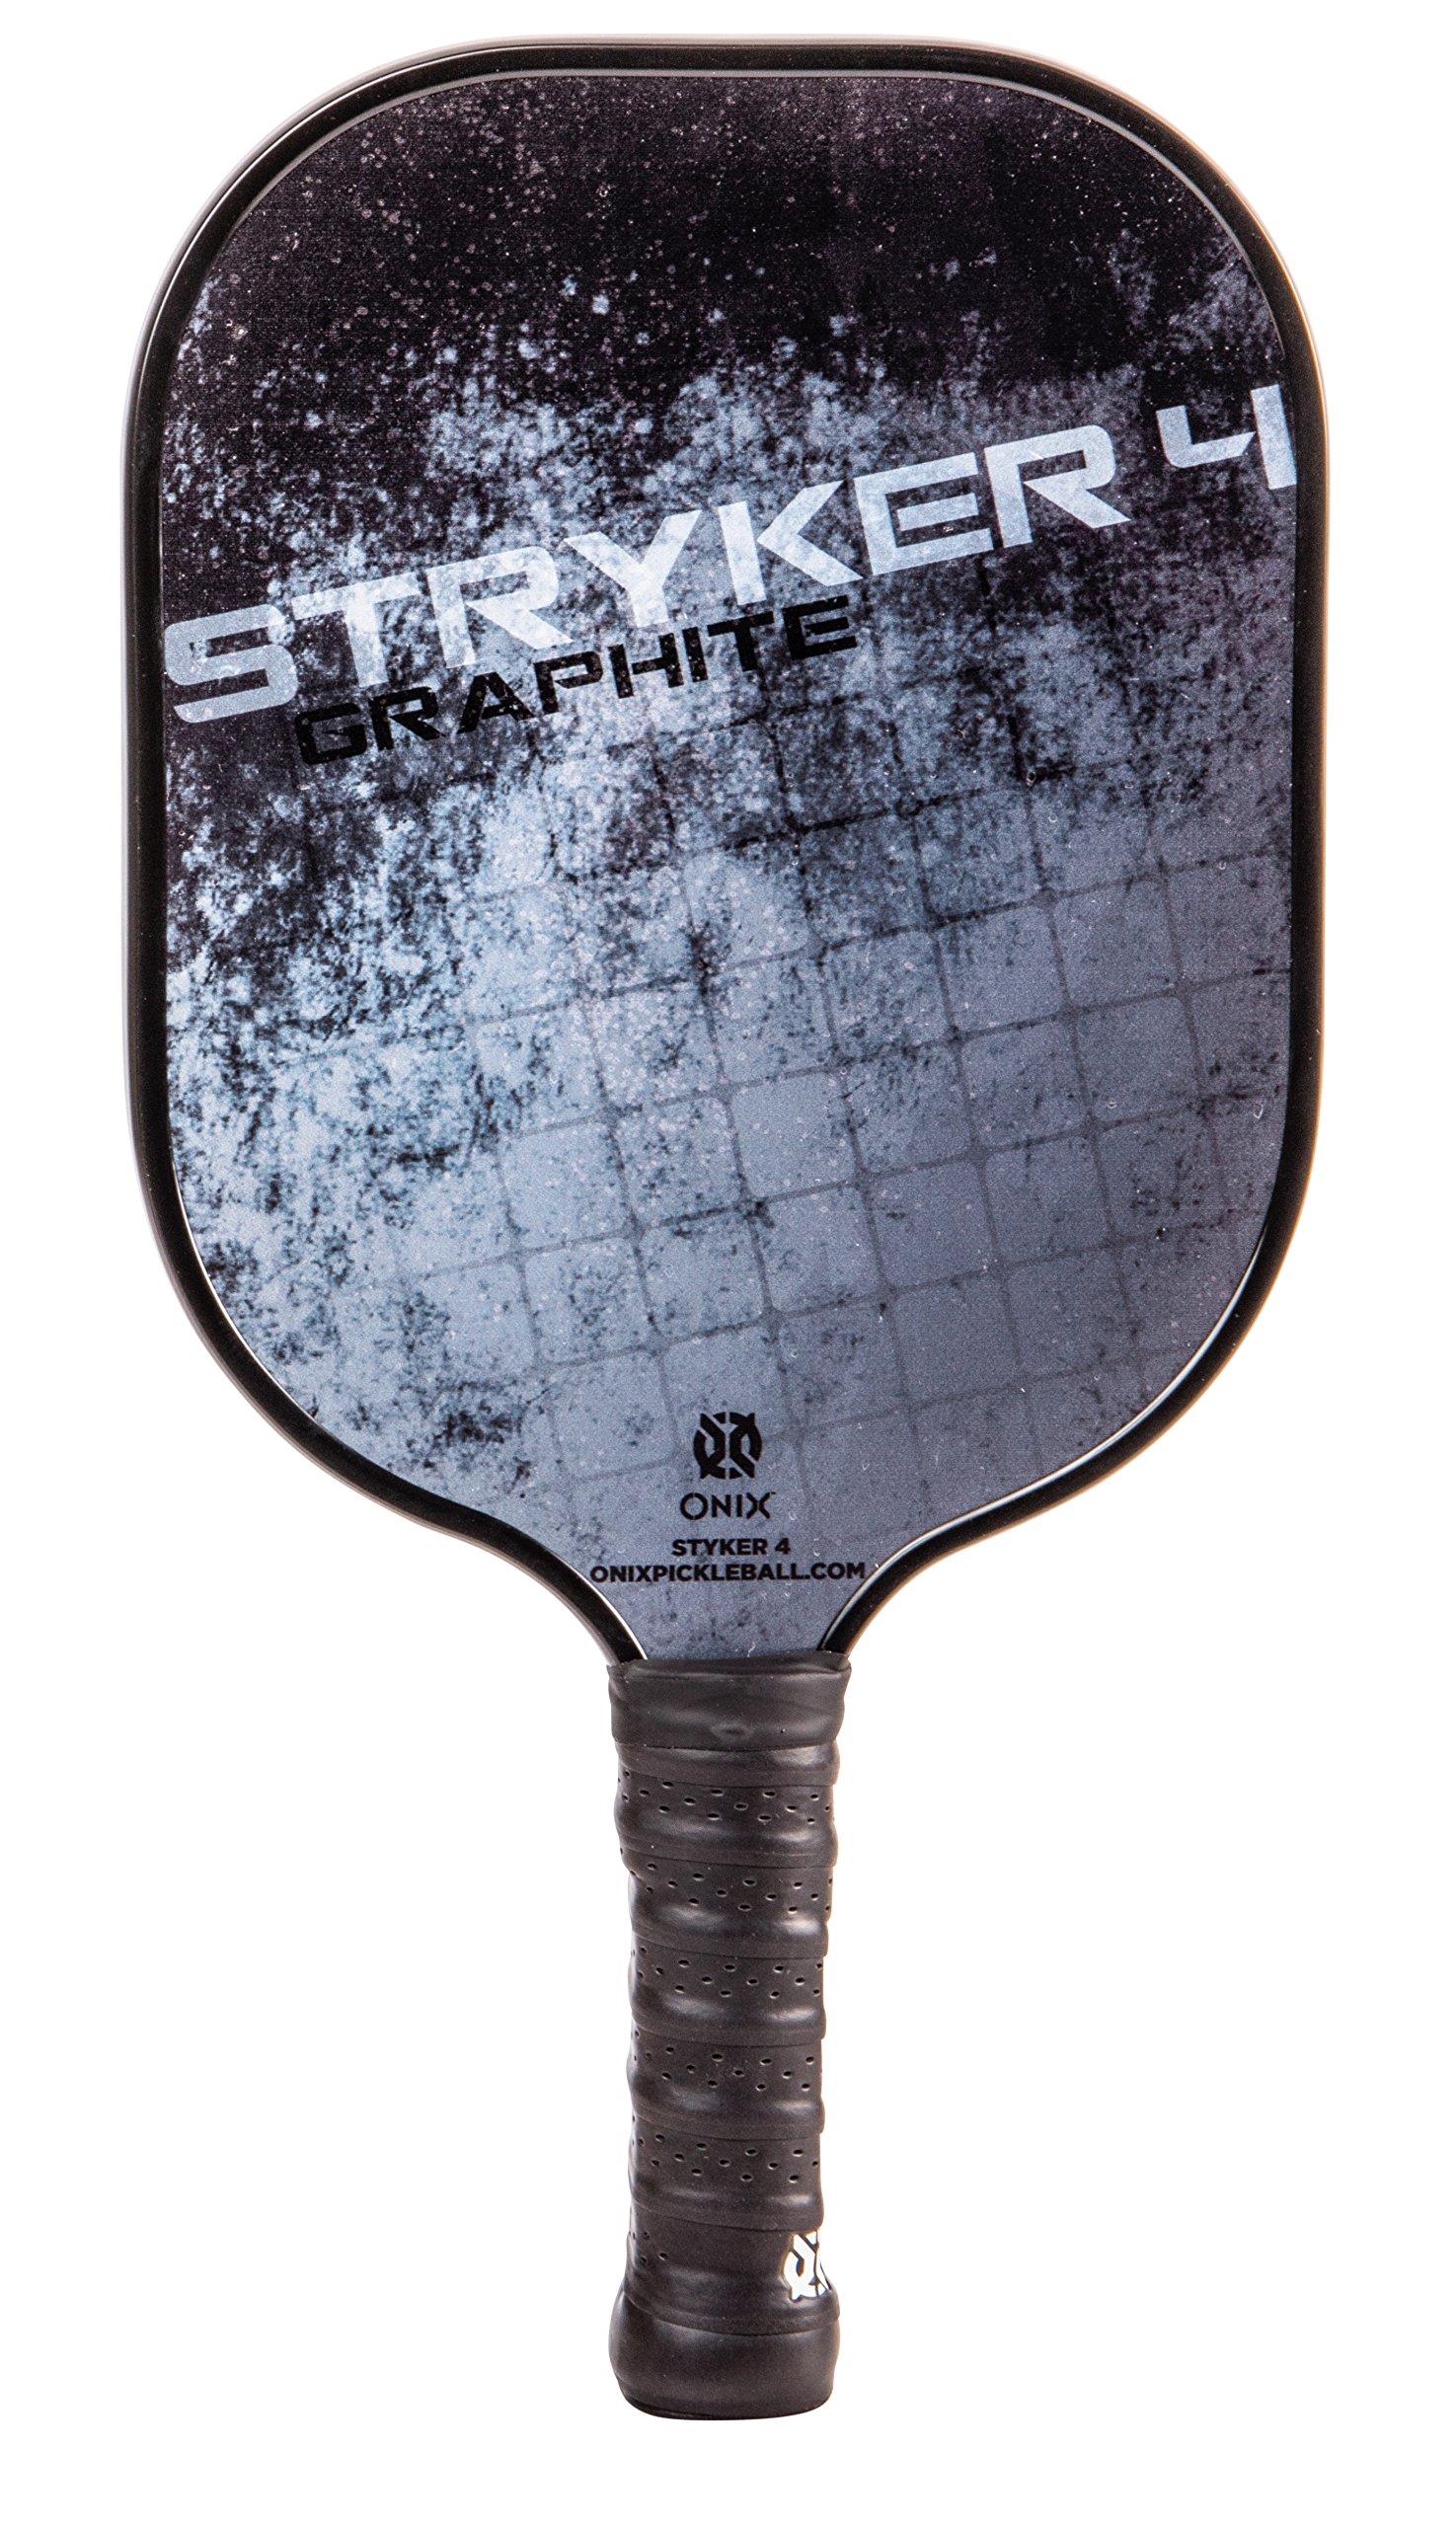 Onix Stryker 4 Pickleball Paddle Features Polypropylen -KVCR